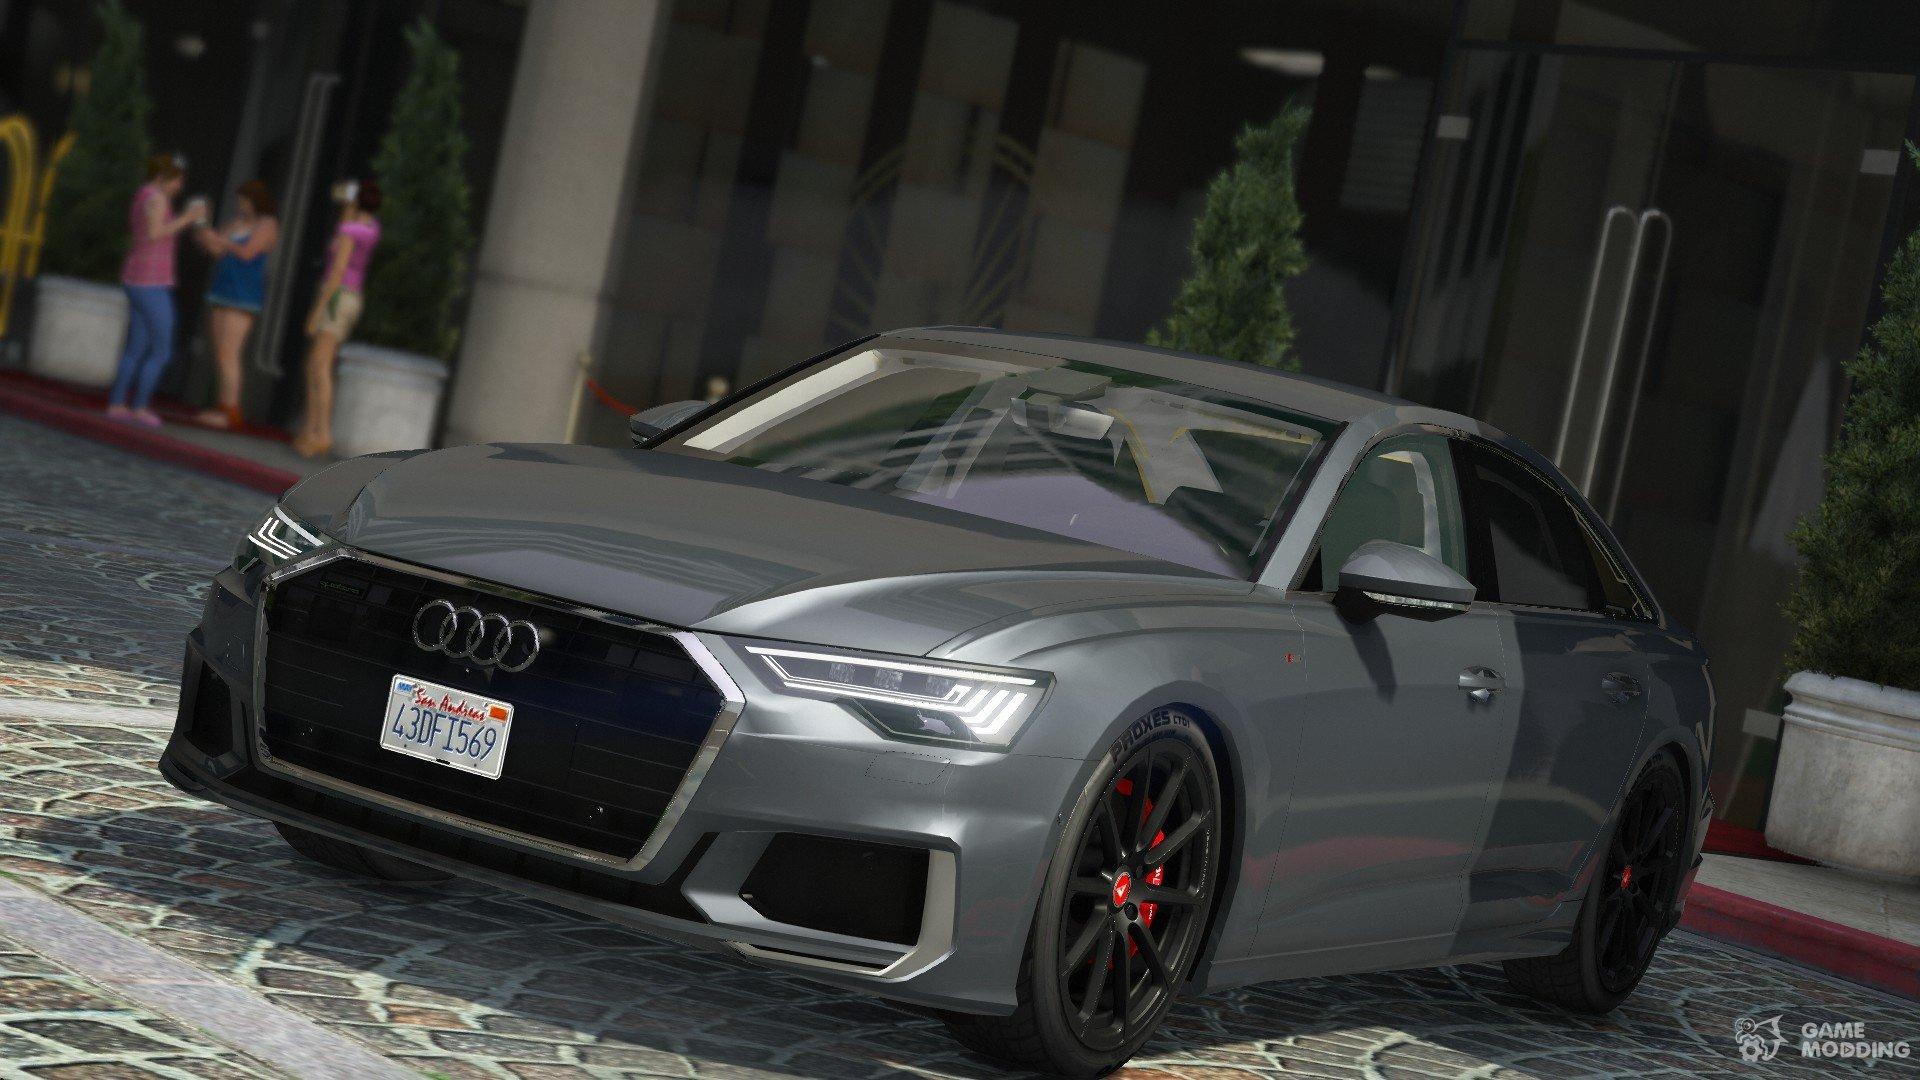 2019 55 Audi A6 Tfsi Quattro S Line For Gta 5